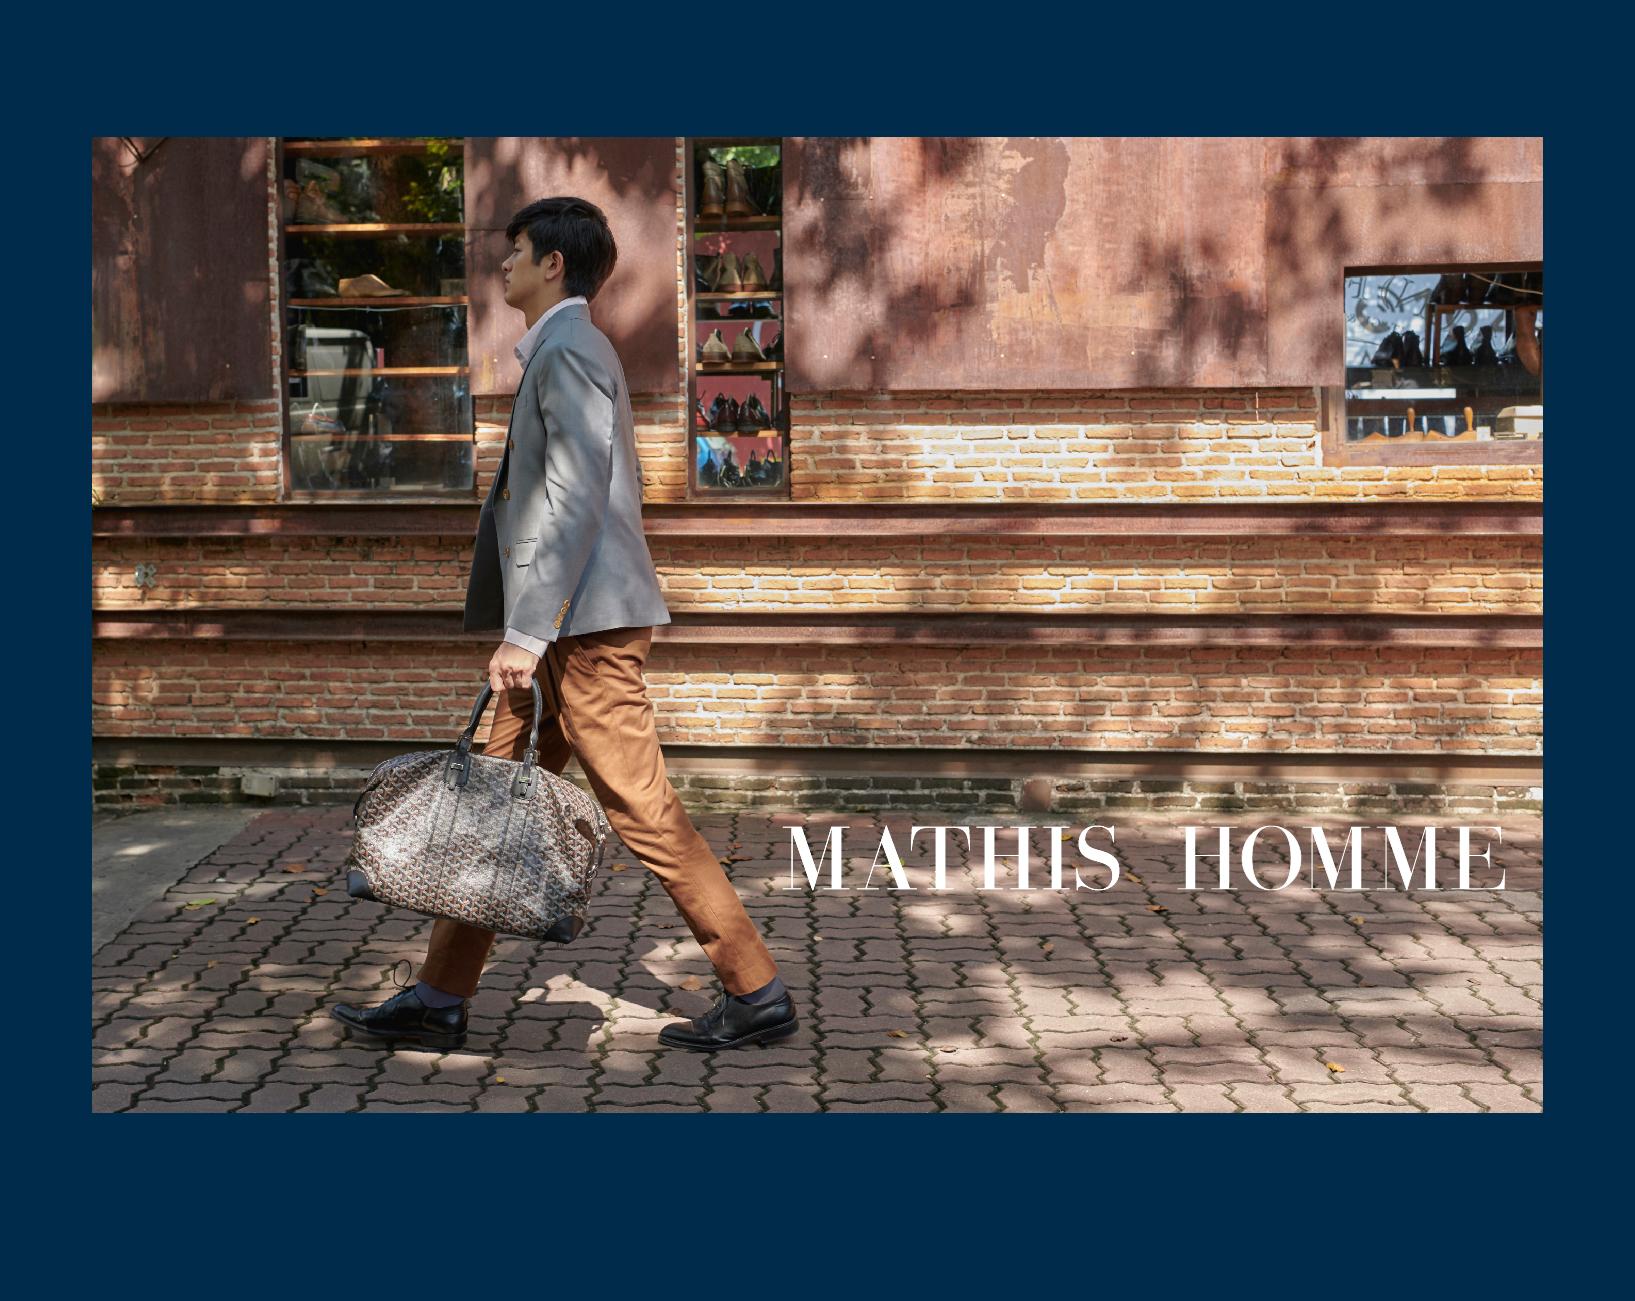 https://s3-ap-southeast-1.amazonaws.com/bchurunway/lookbook/mathis/lookbook_MATHIS_edit_photo-05.jpg